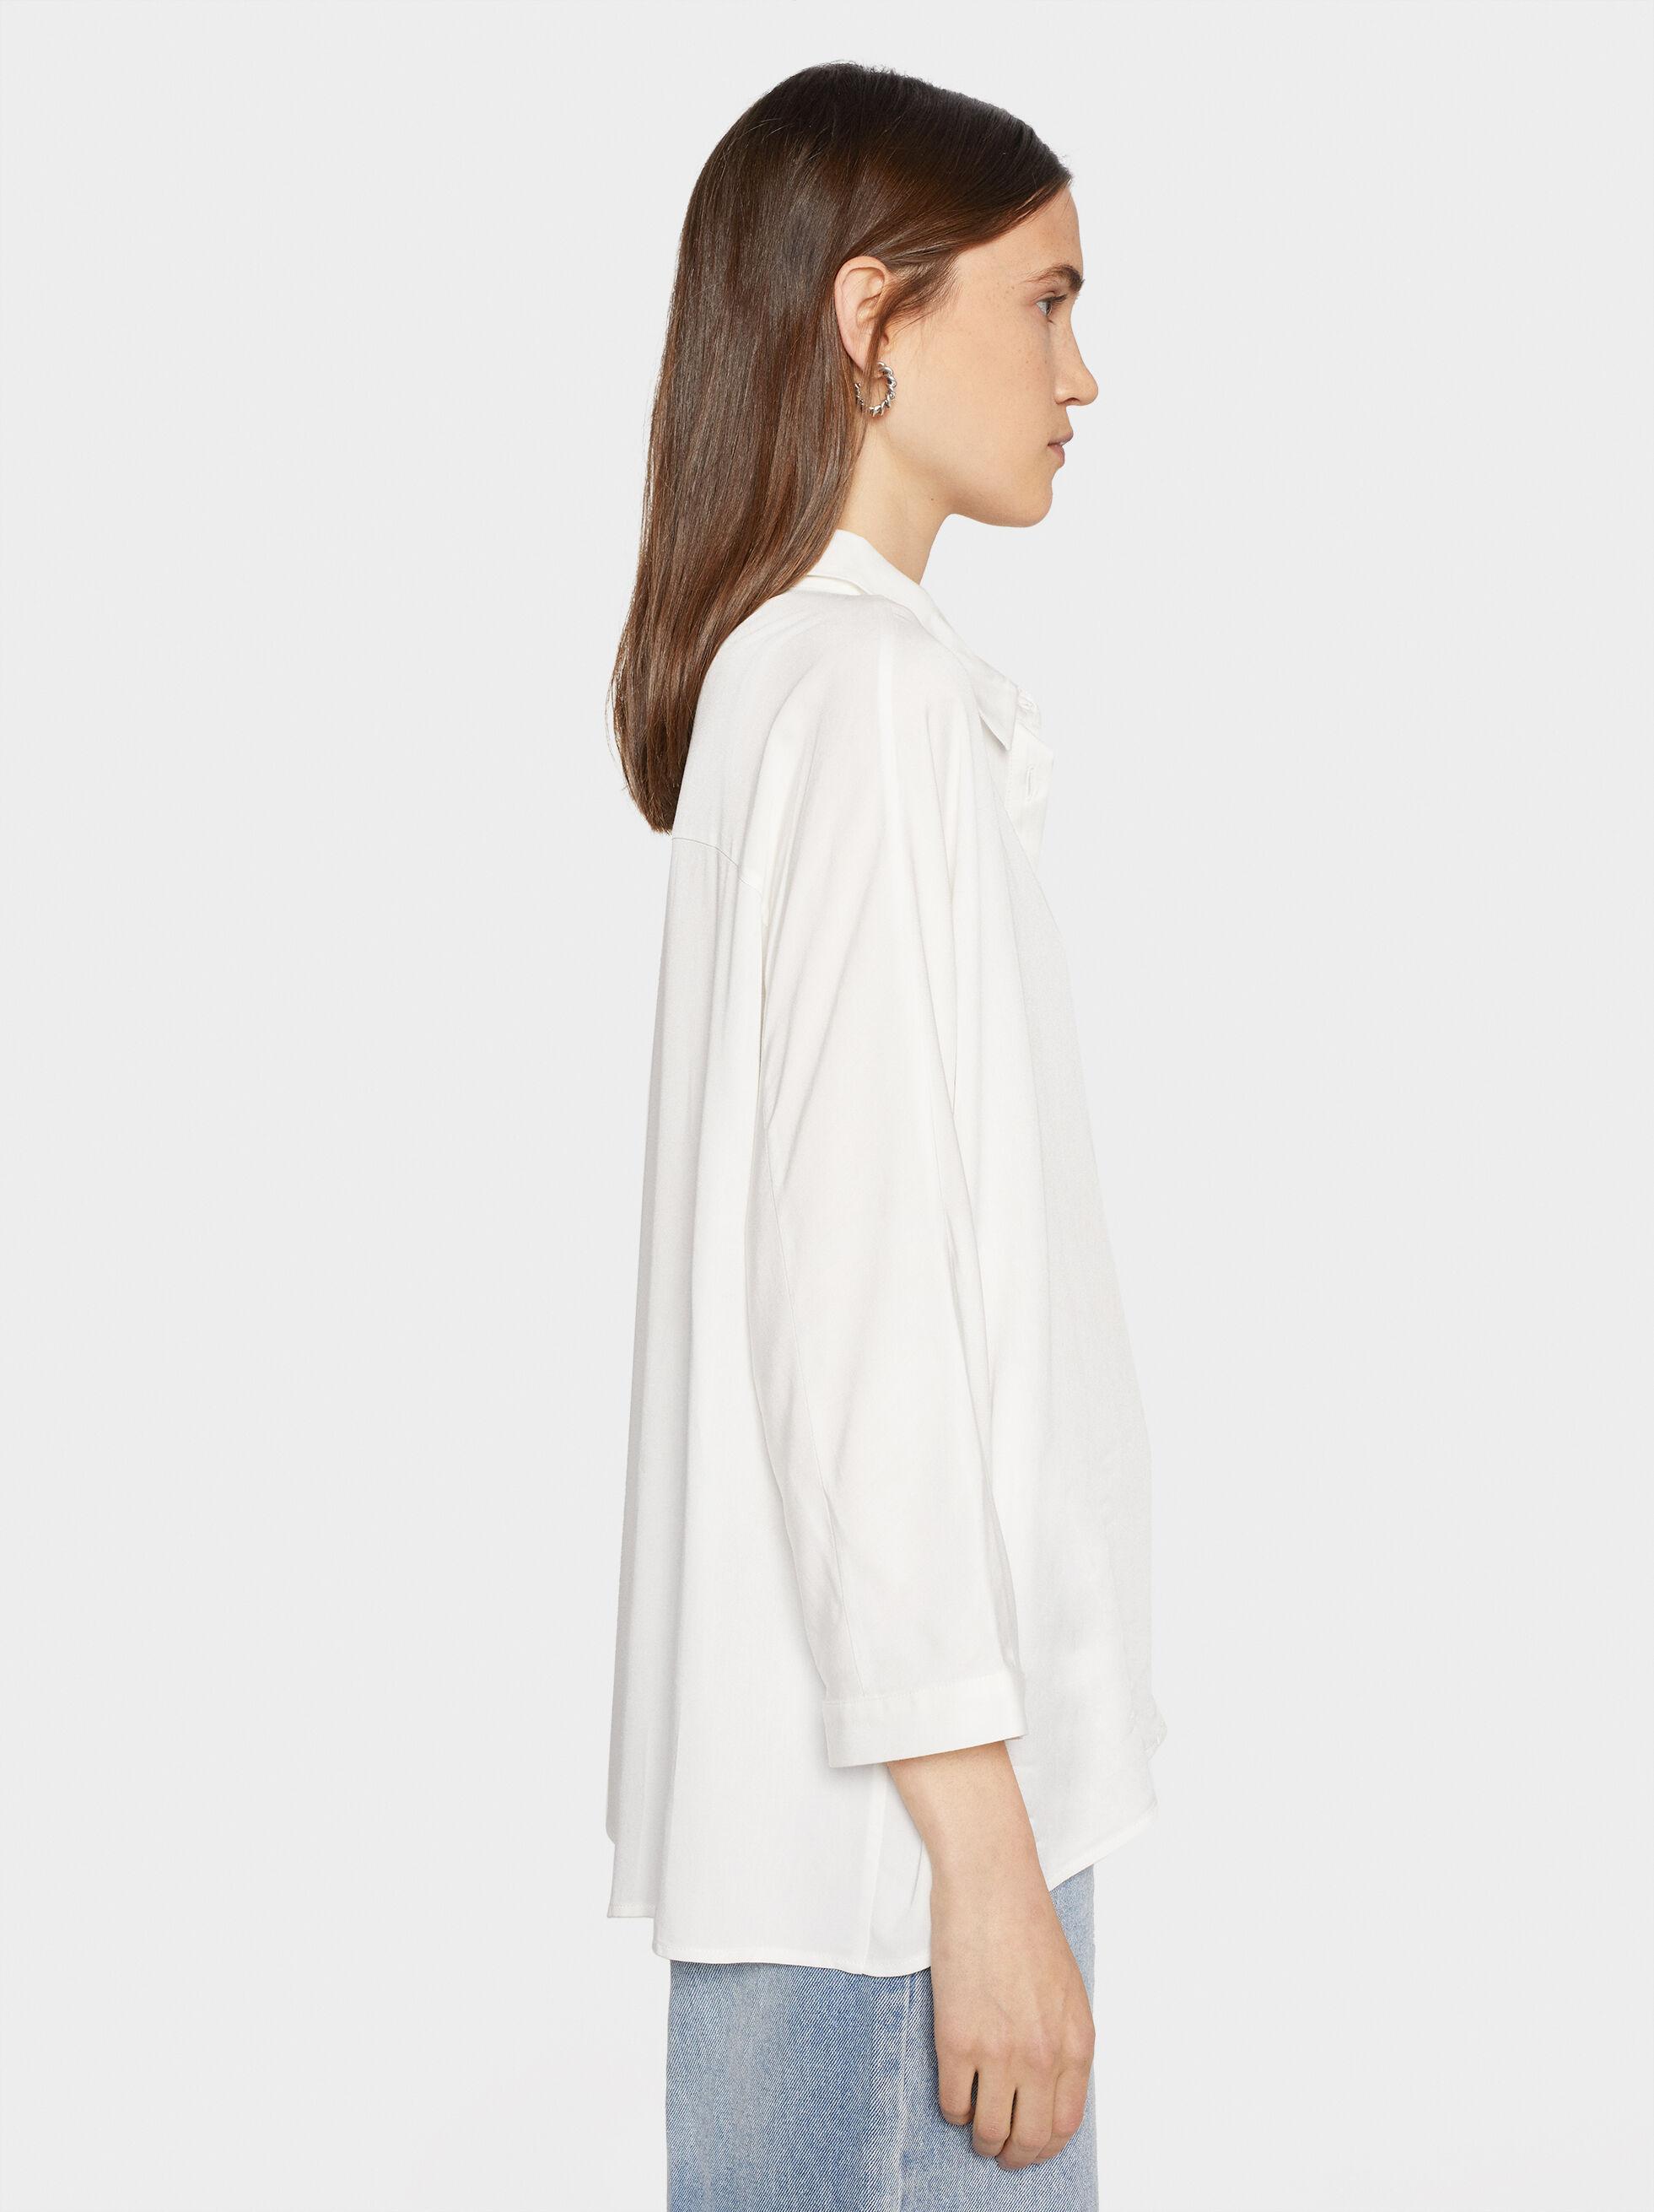 Camisa Basic, Blanco, hi-res